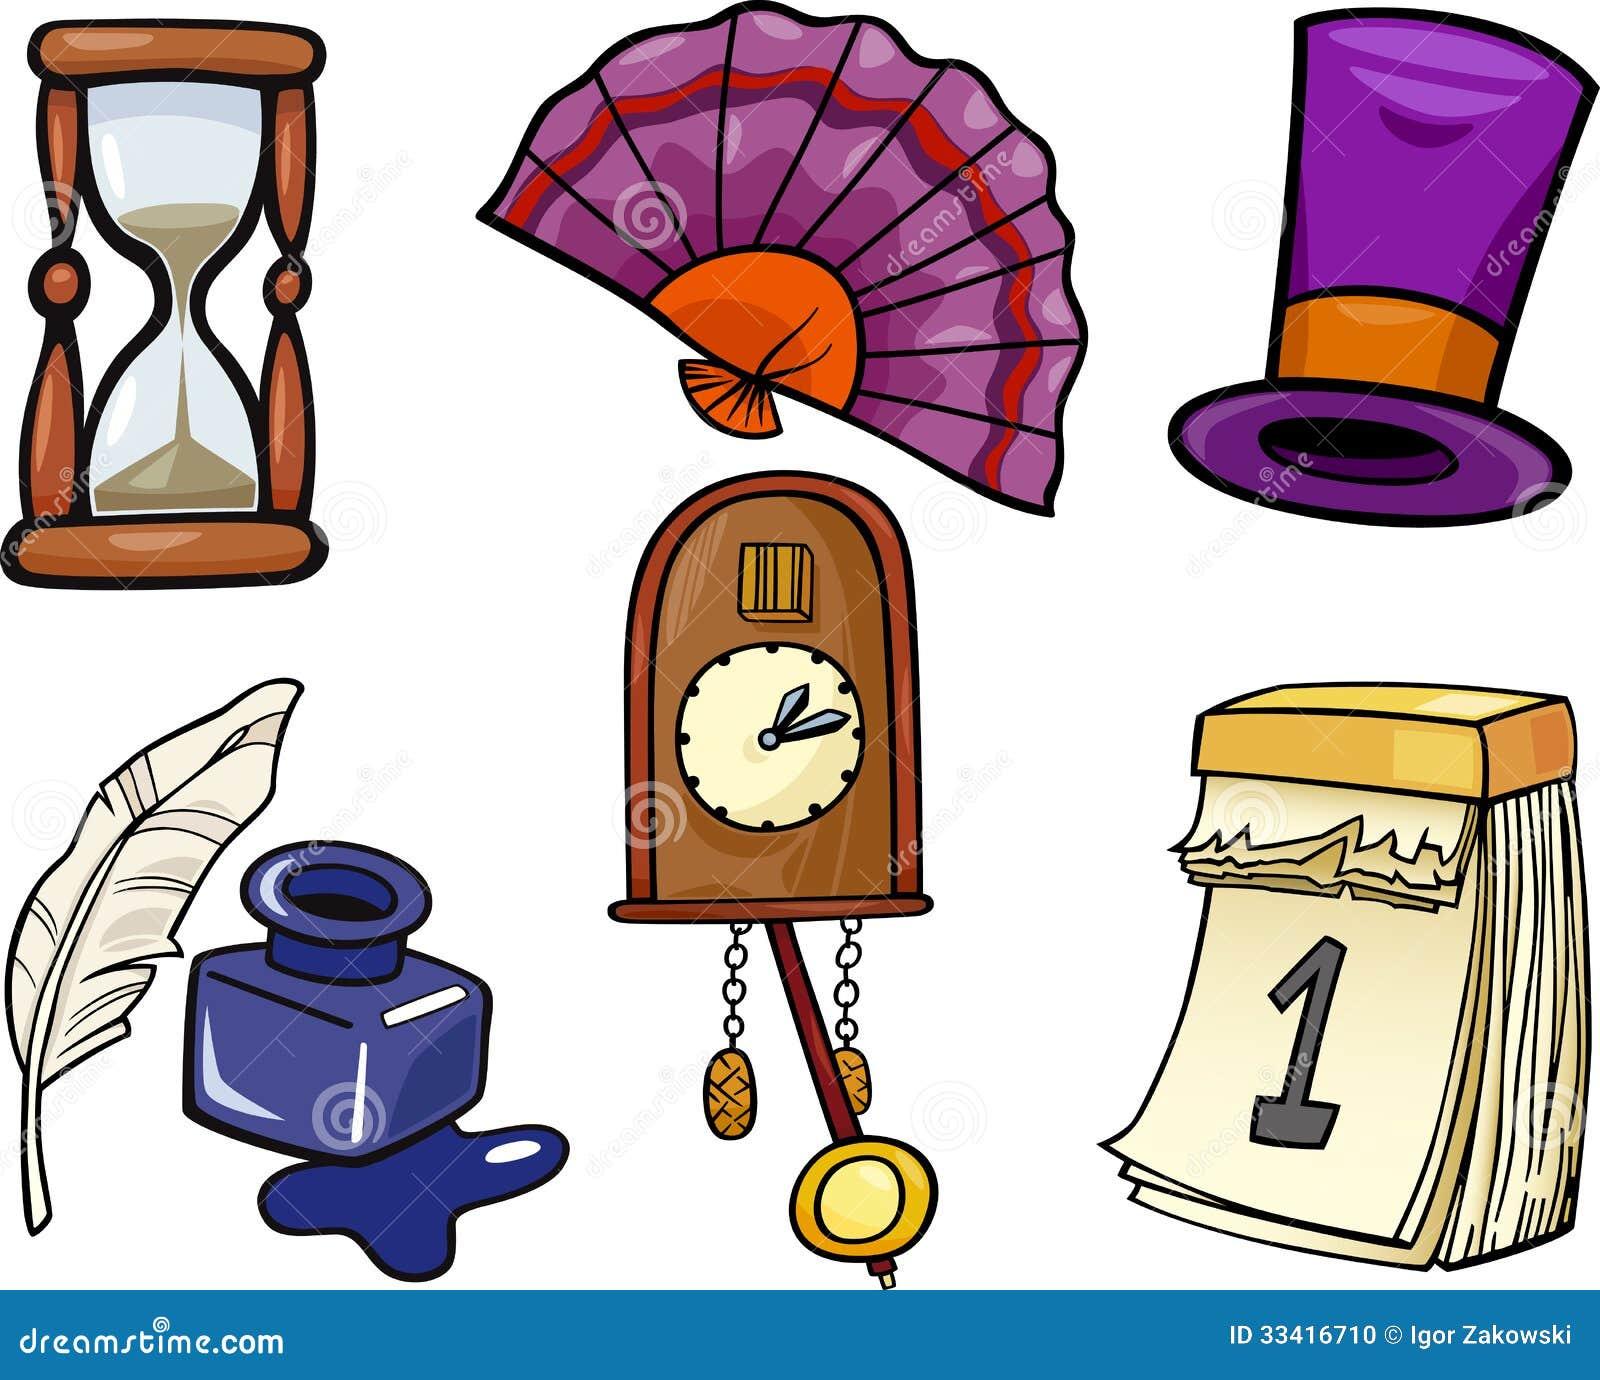 Cuckoo Clock 986775 moreover Photo Stock Horloge De Coucou Image14880620 moreover Royalty Free Stock Photography Vintage Cuckoo Clock Image29110077 besides Interaction moreover Ridgeway Belmont Grandfather Clock 2509. on cuckoo clock vector